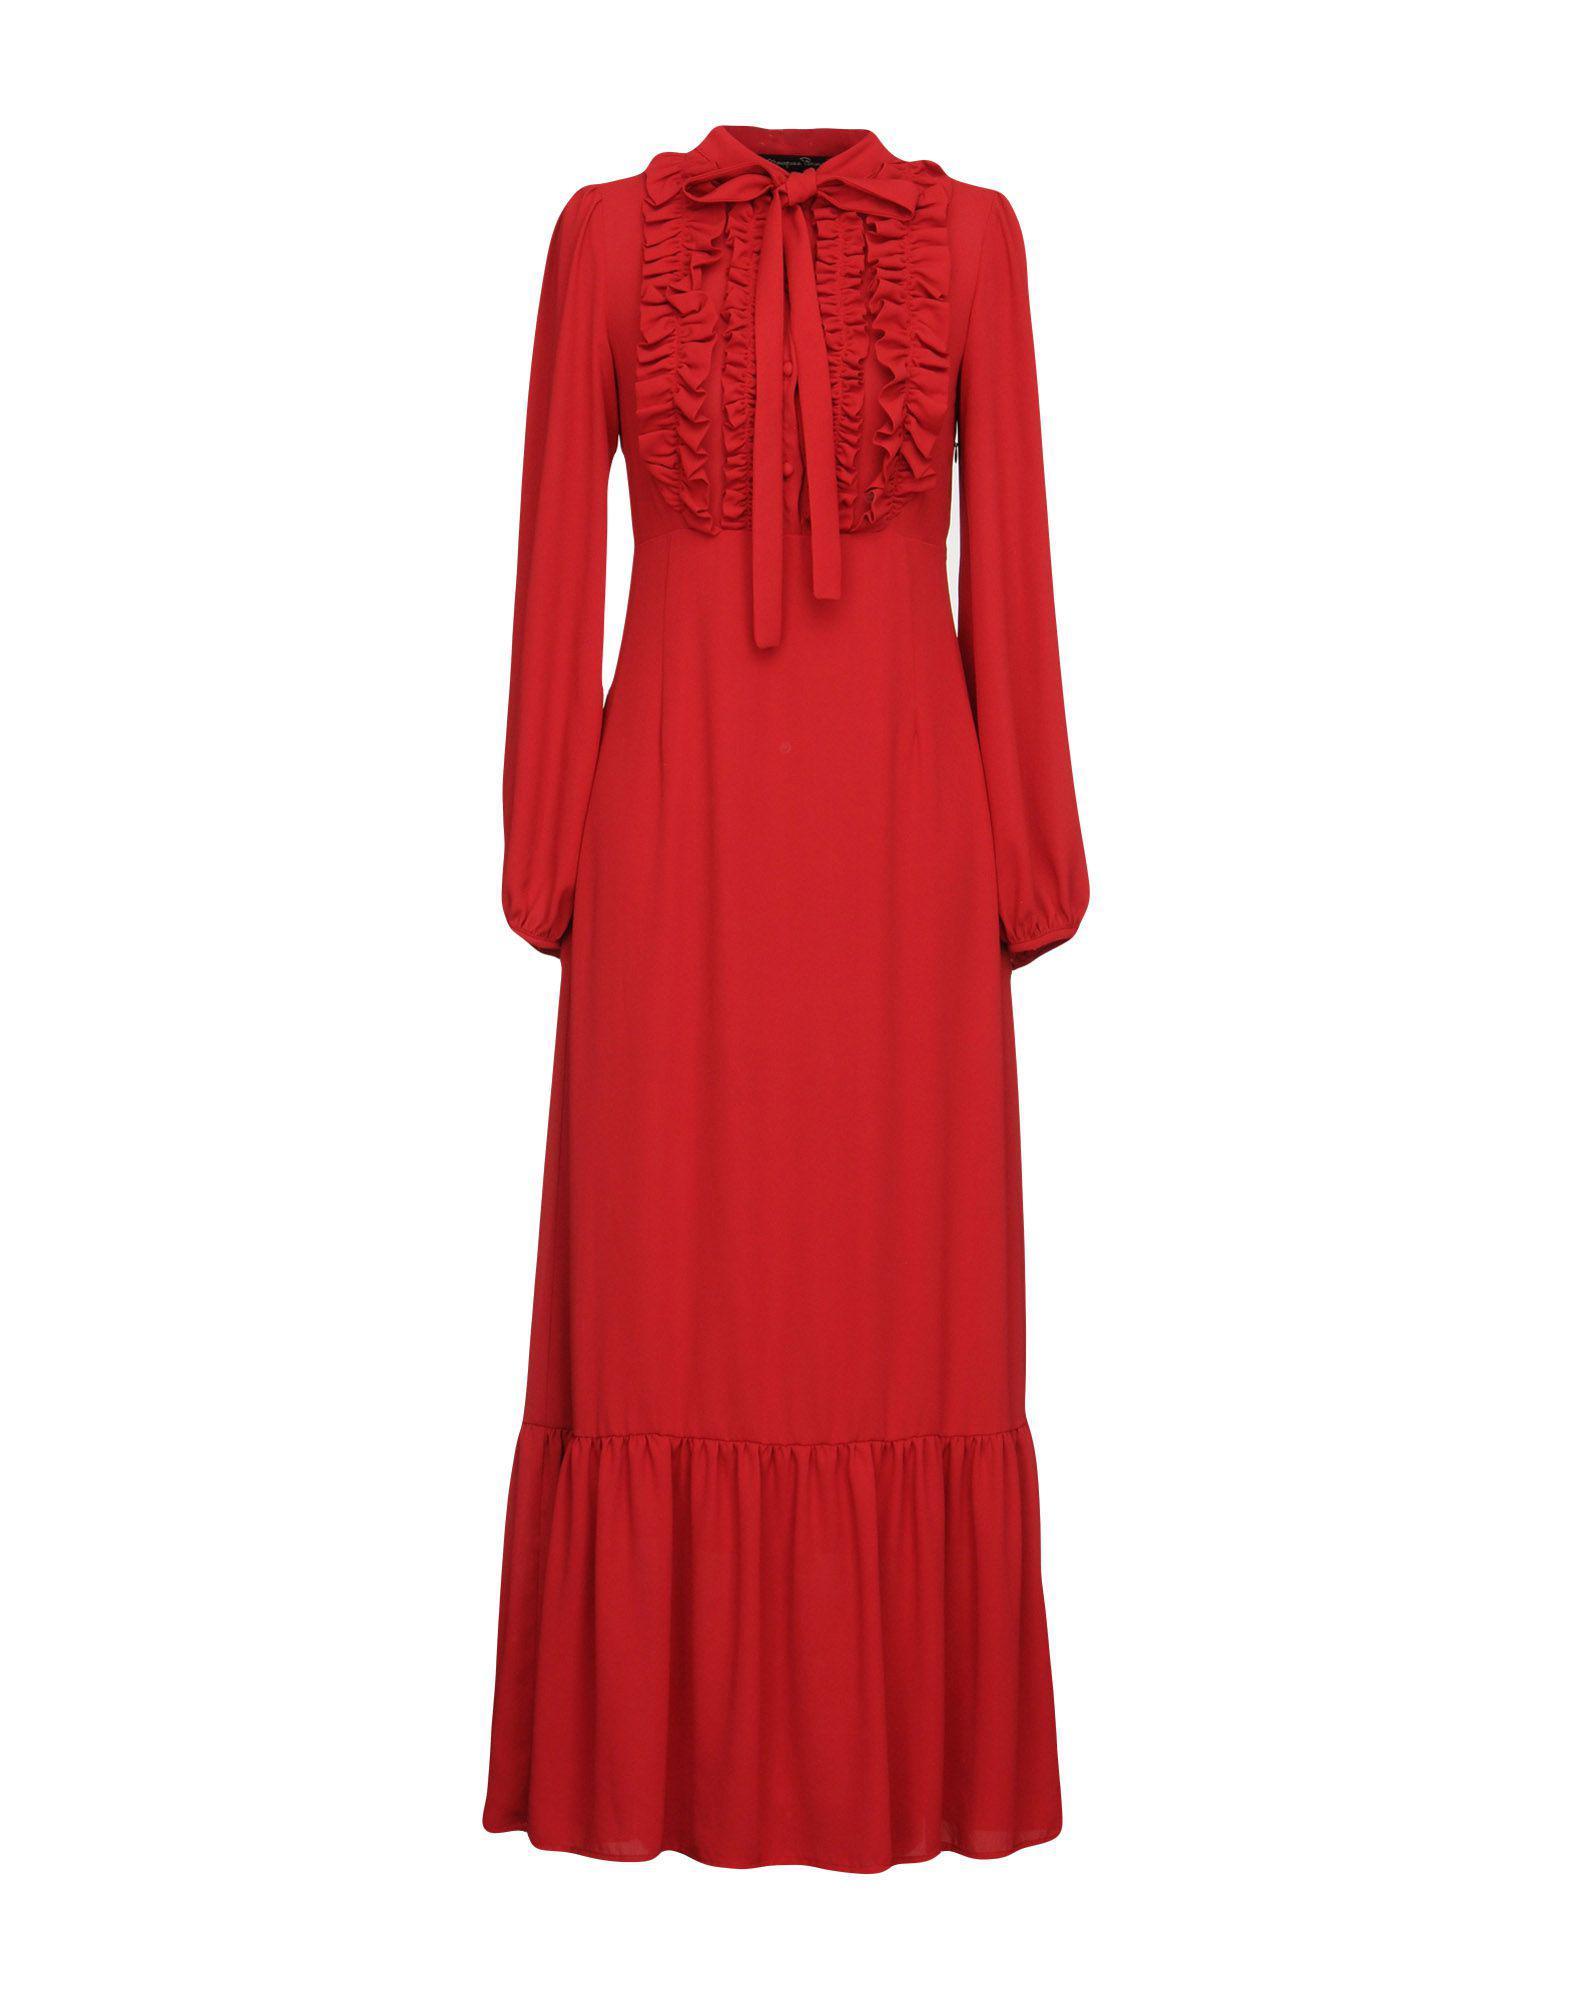 DRESSES - Long dresses Mariagrazia Panizzi Pre Order Good Selling Online 8oZXKXu